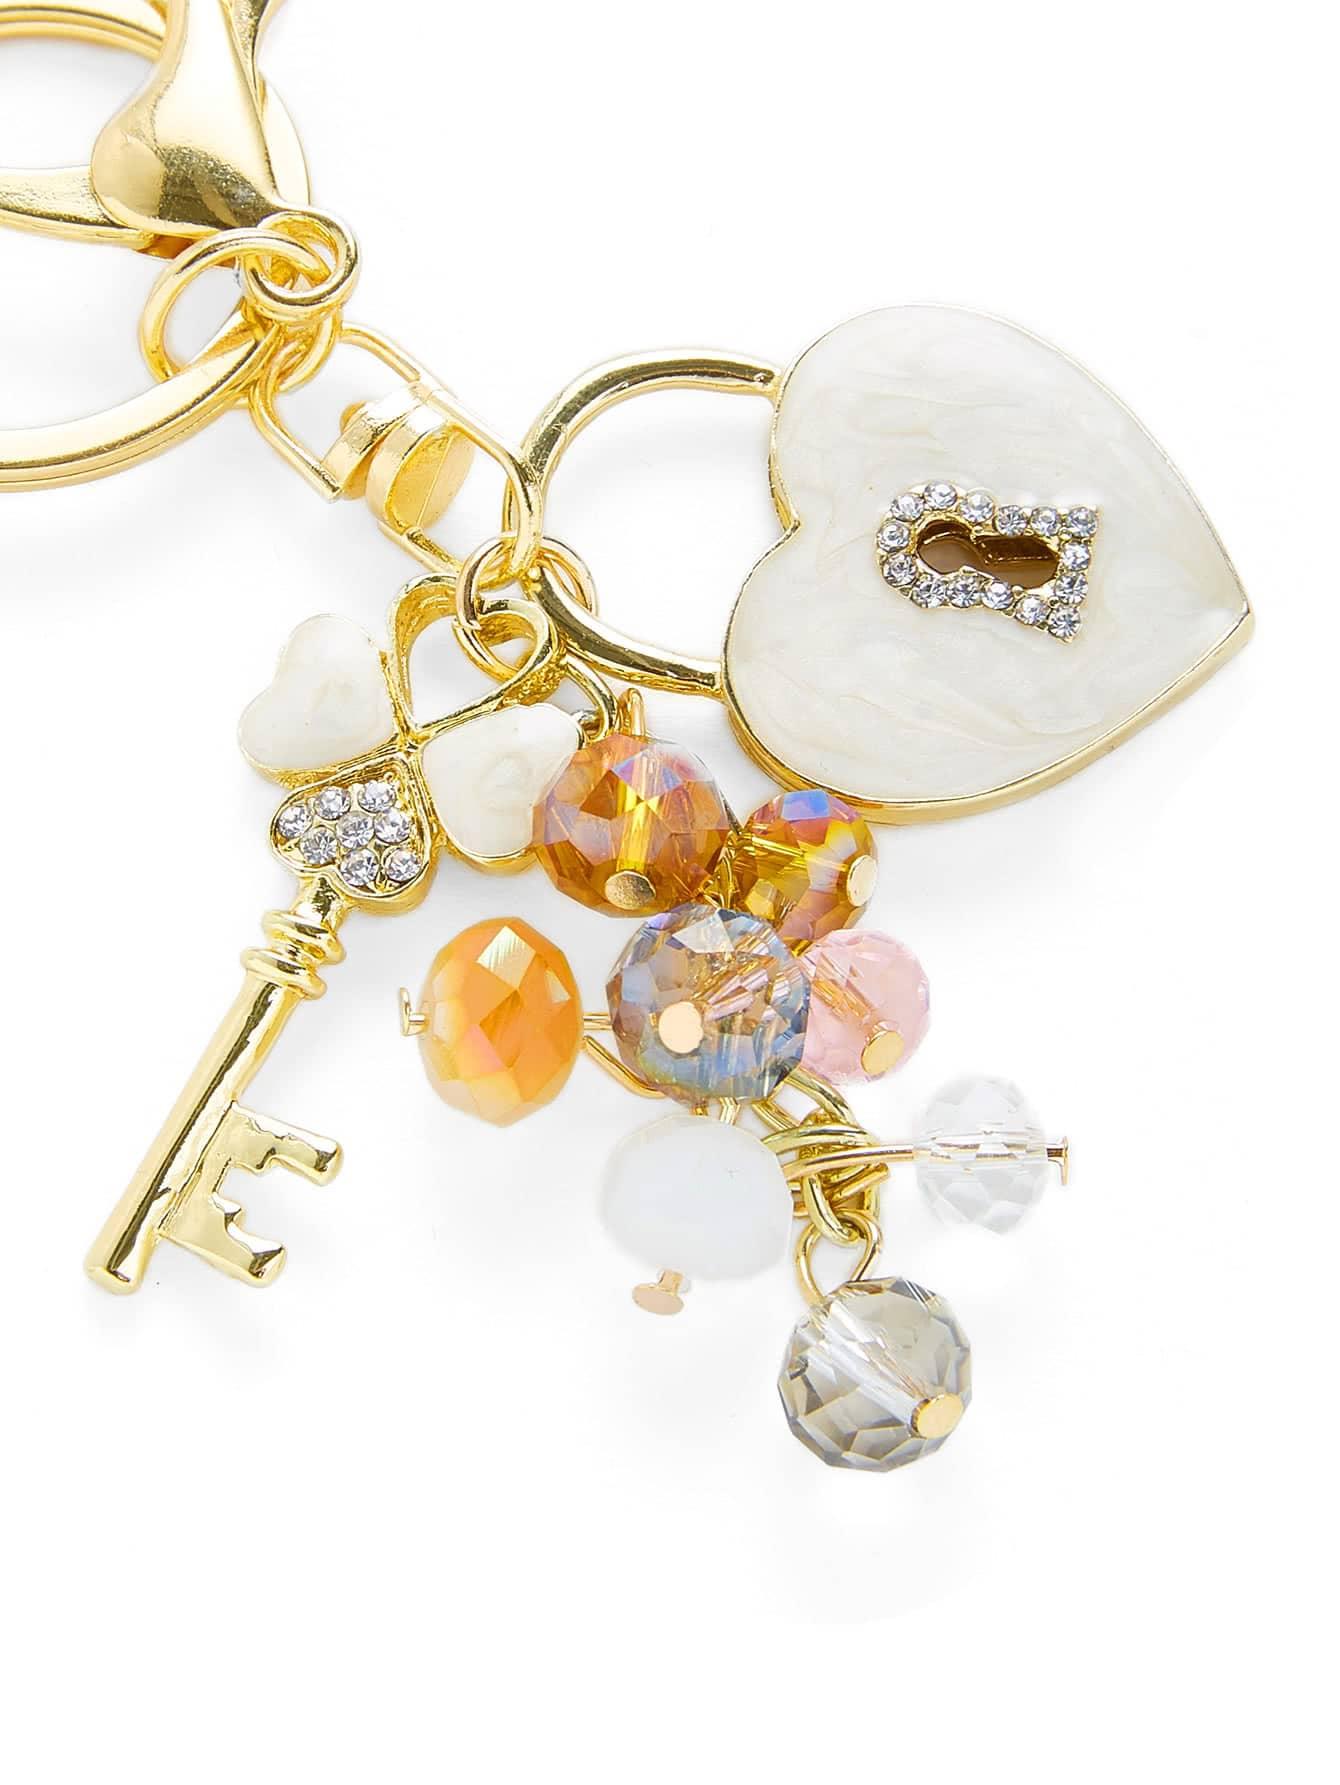 Heart & Key Design Keychain With Crystal